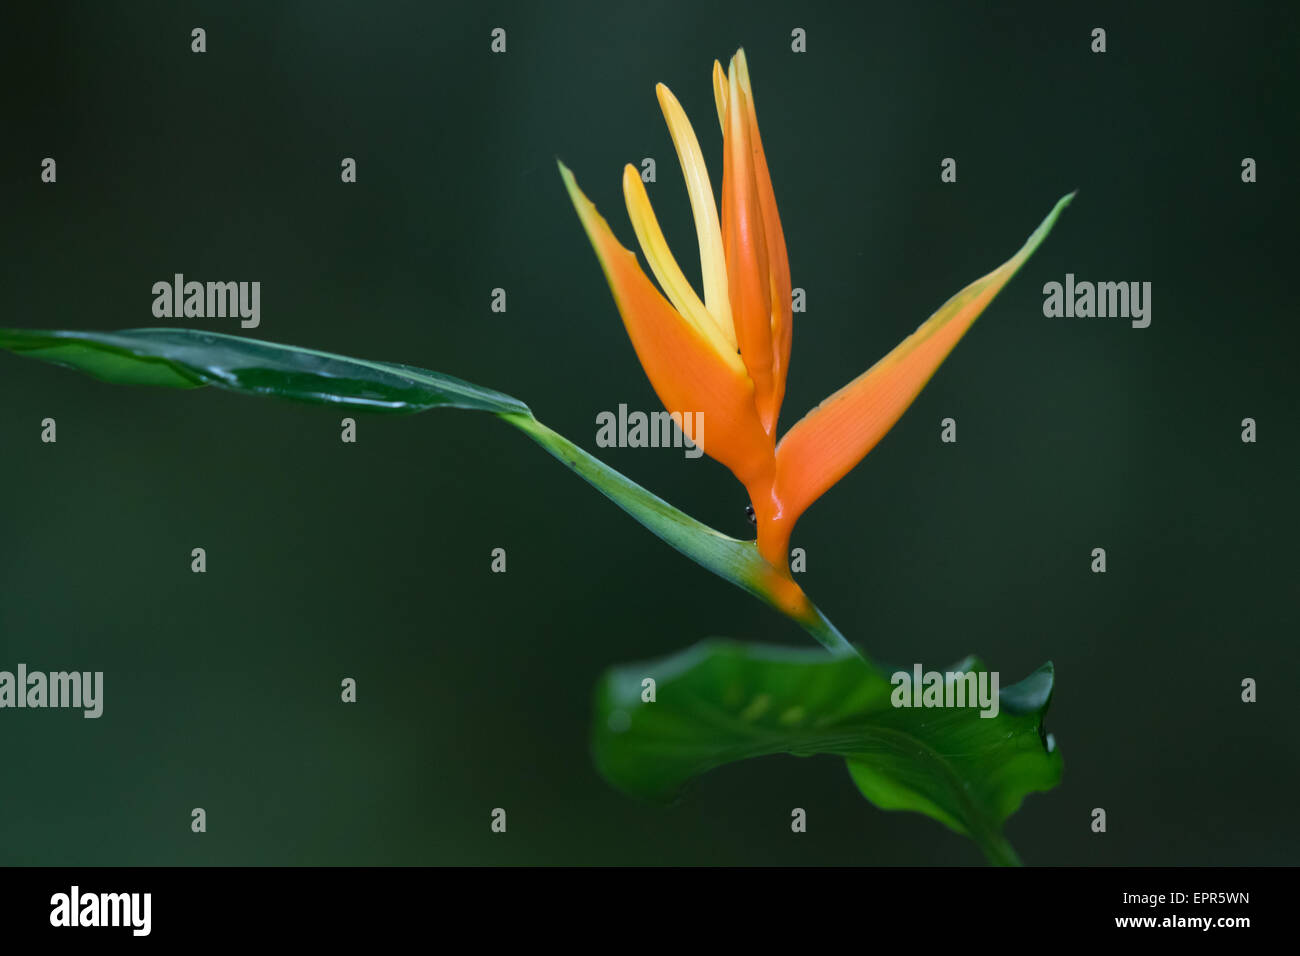 Bird-of-Paradise flower (Heliconiaceae) - Stock Image